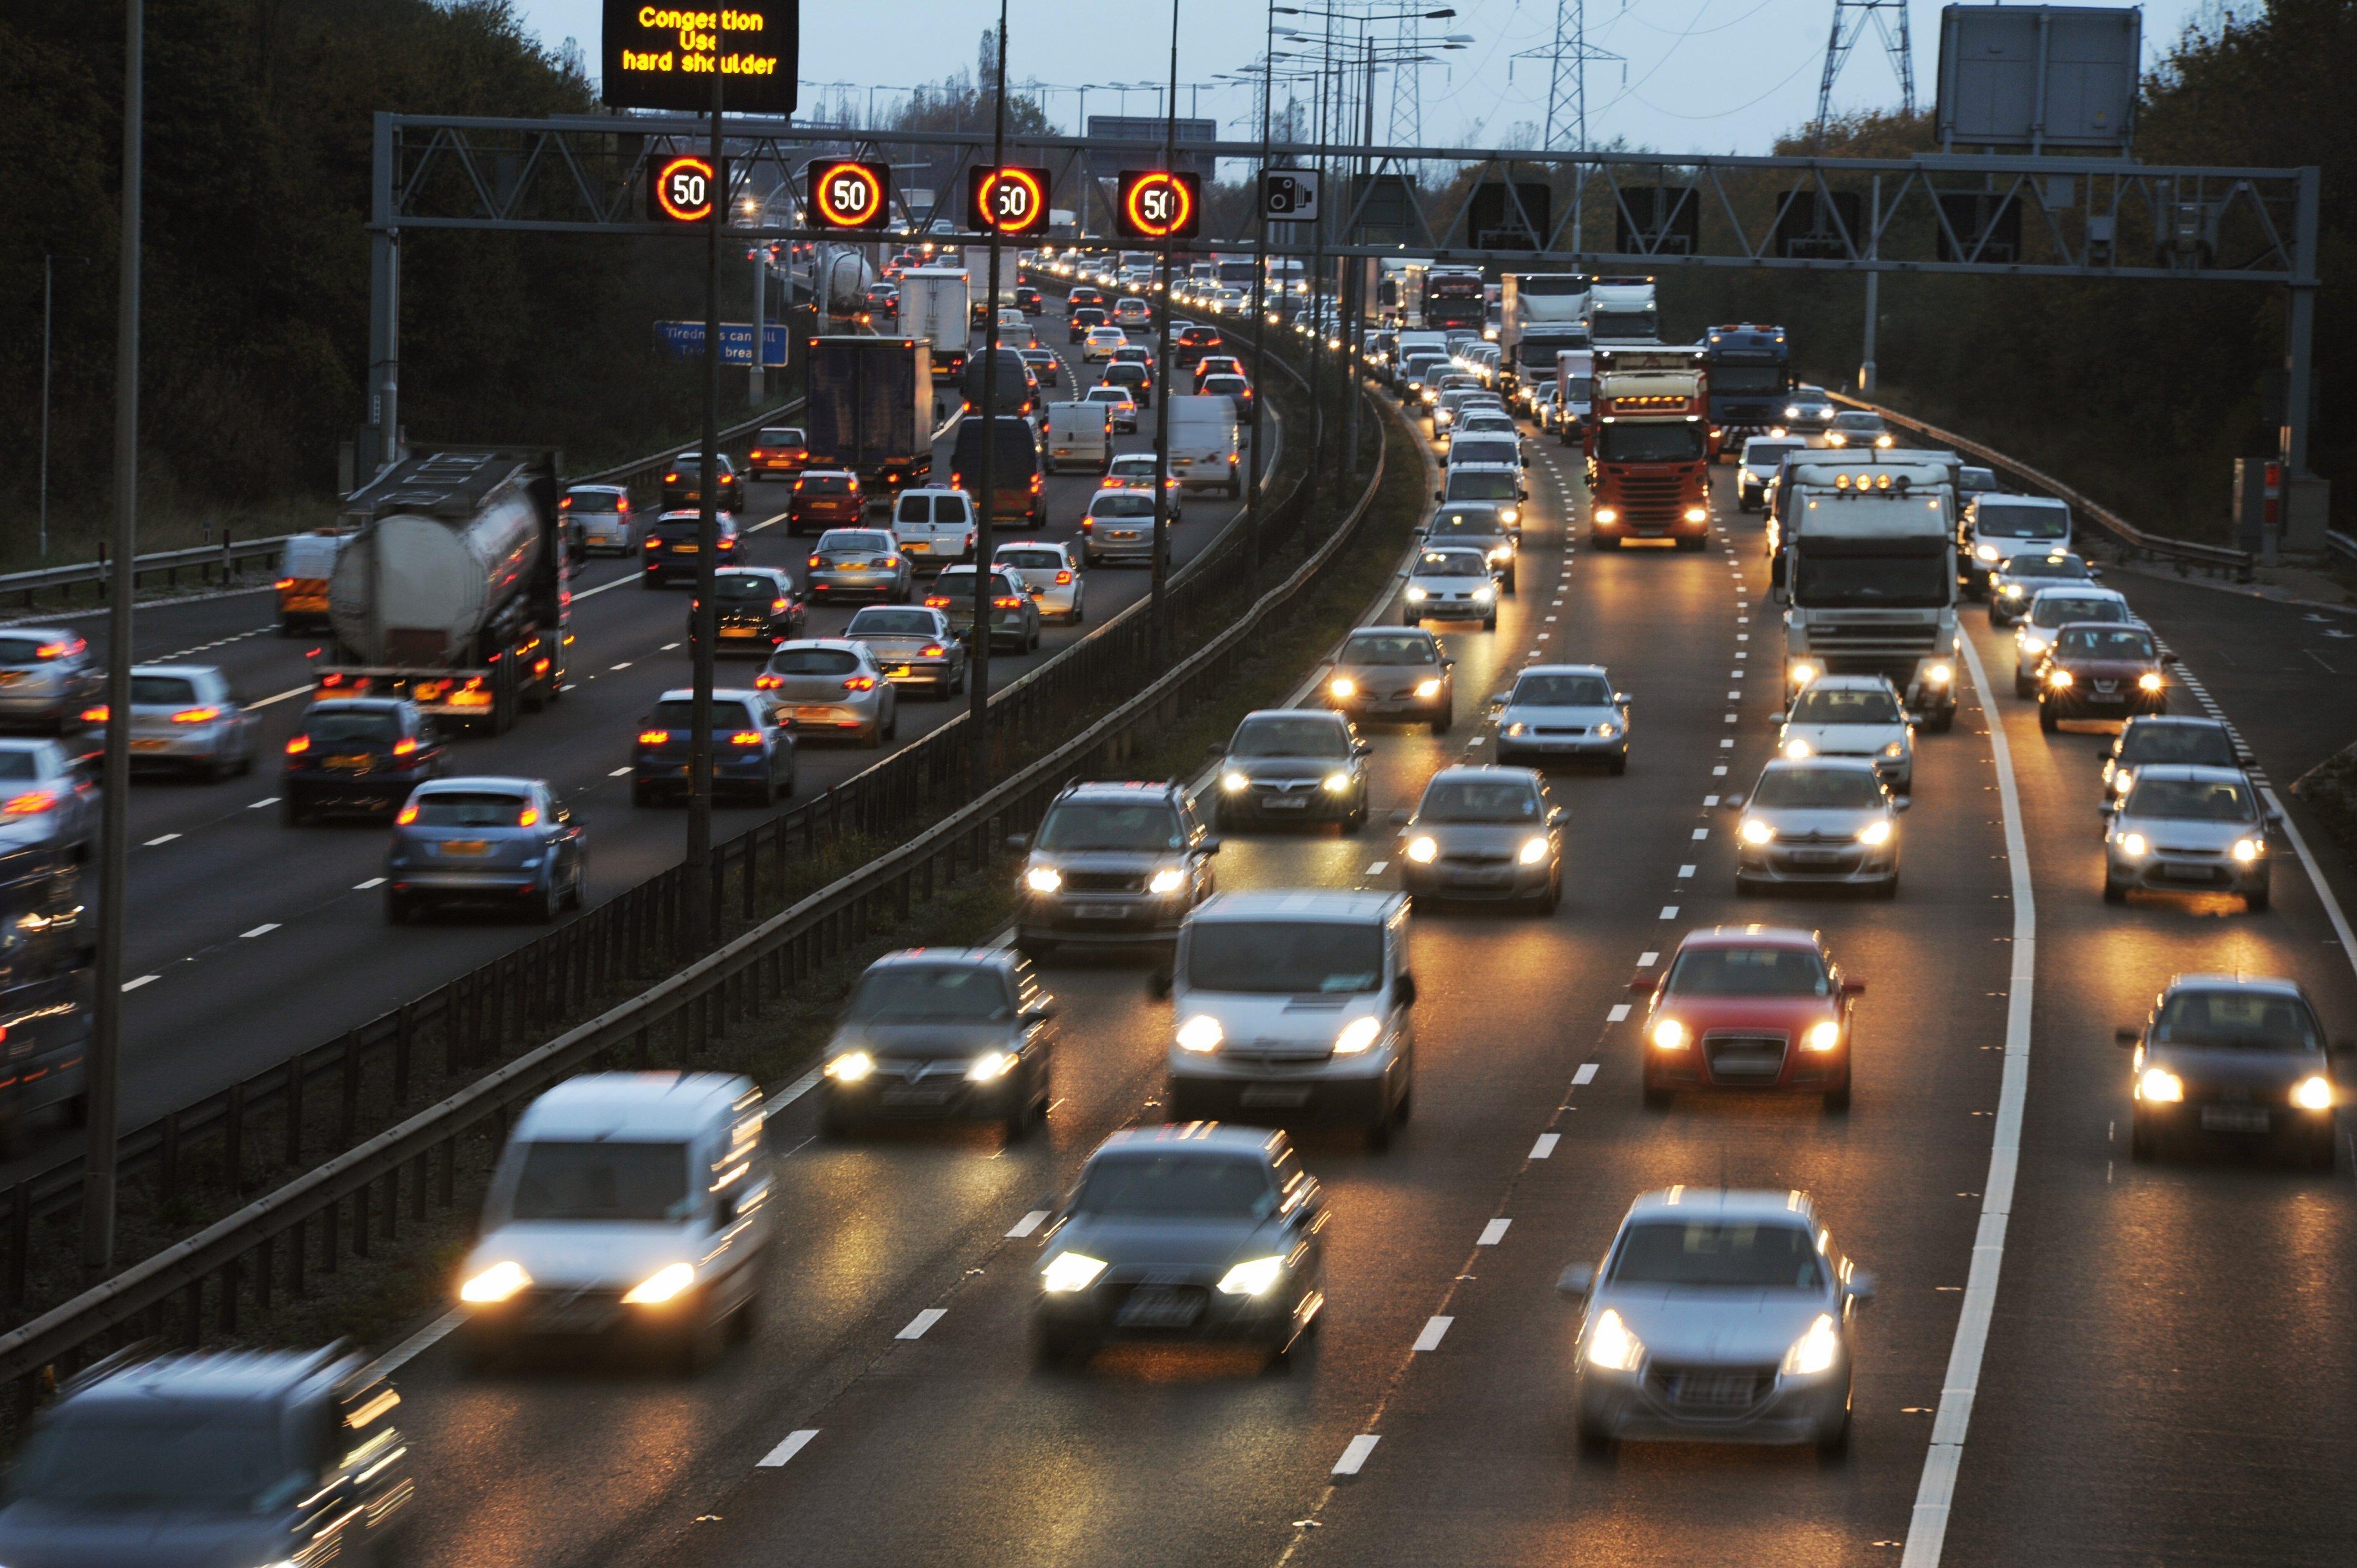 Rush hour traffic on the M6 Motorway. A smart motorway.